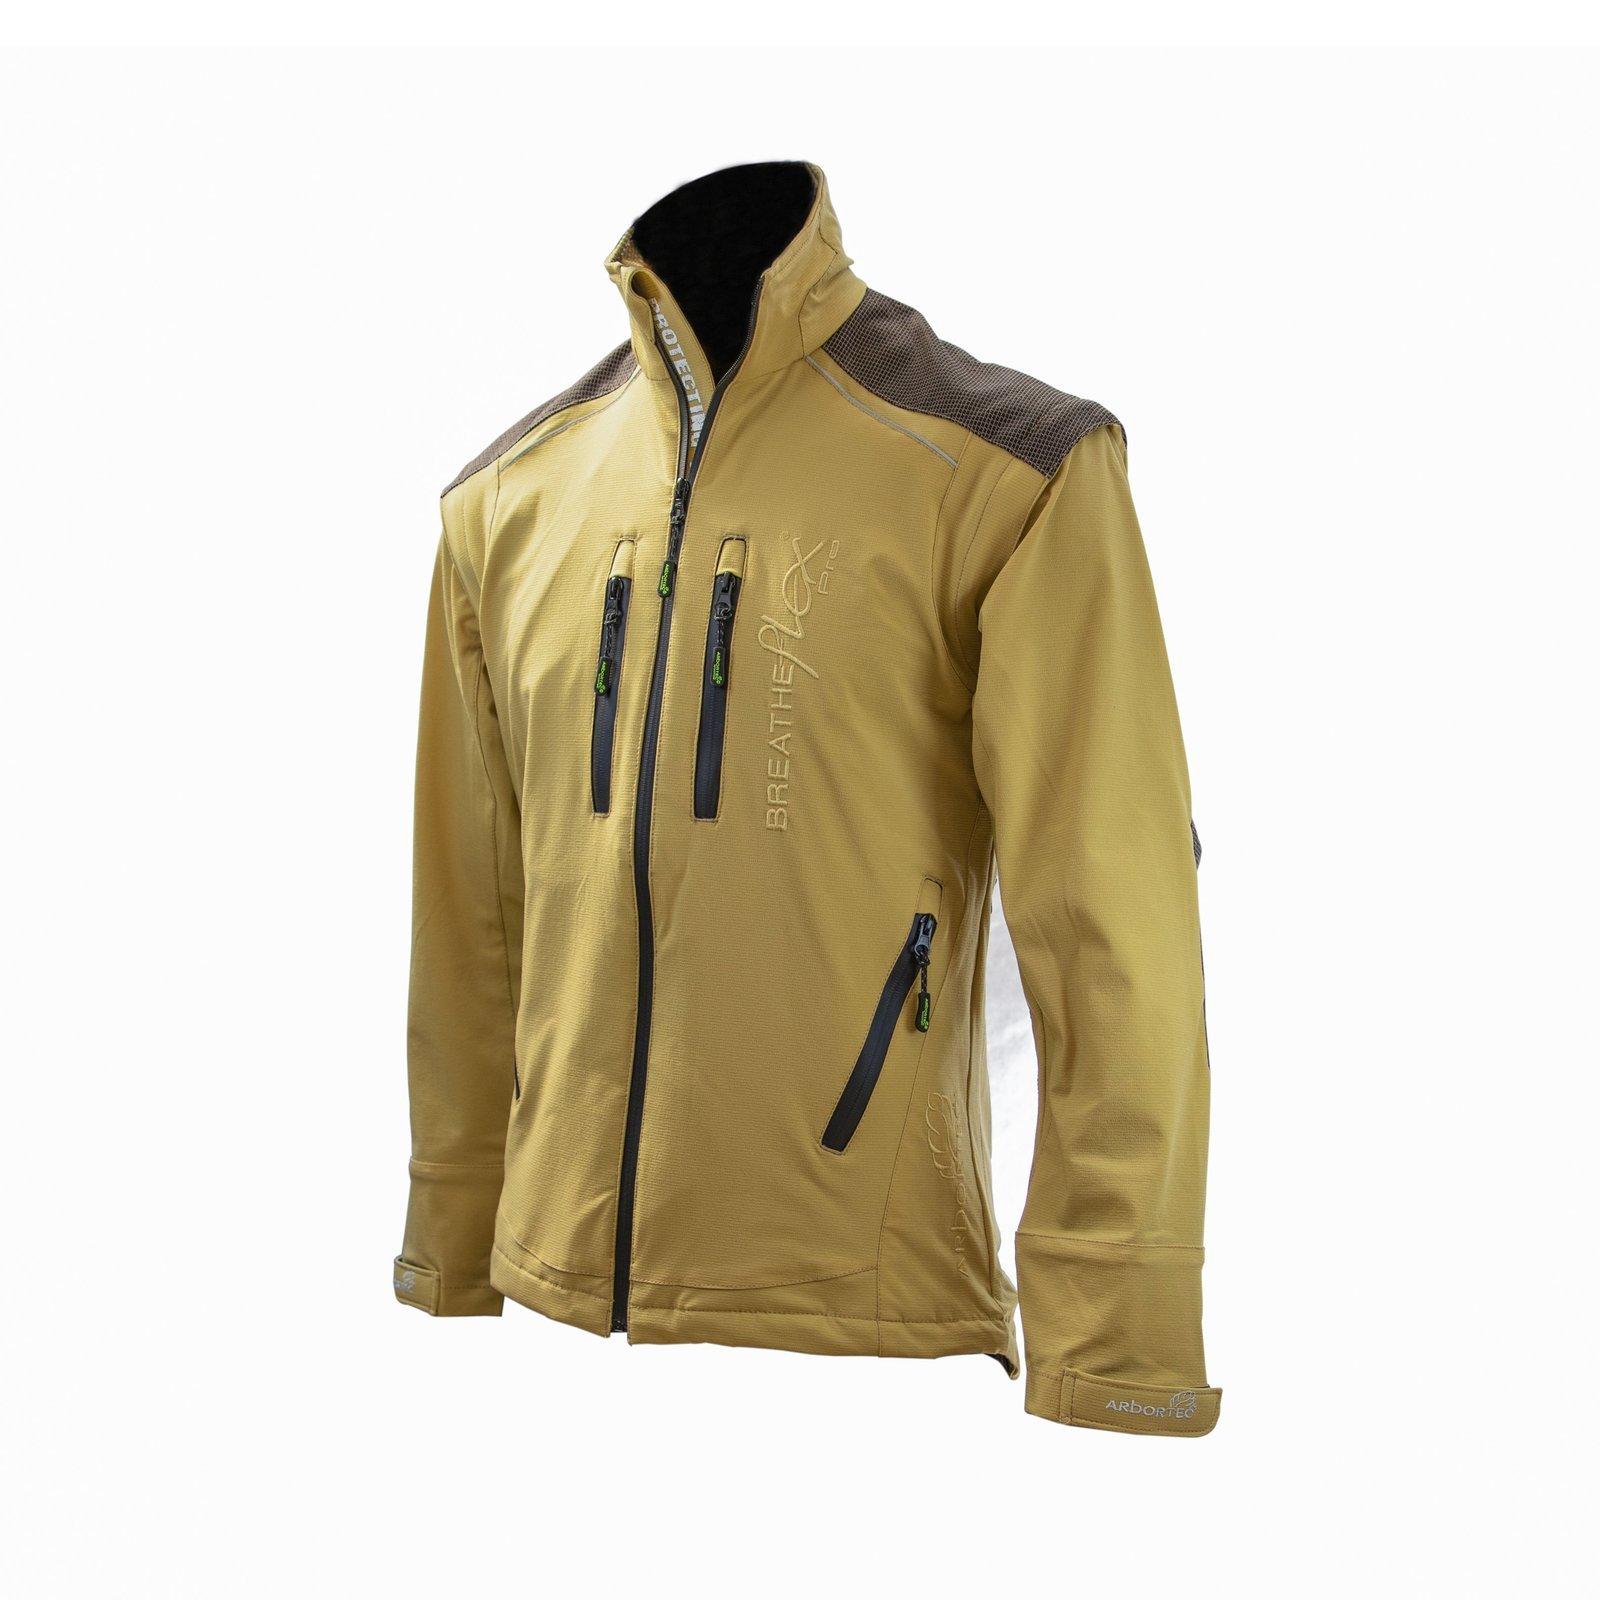 ARBORTEC Breathedry PRO Work Jacket